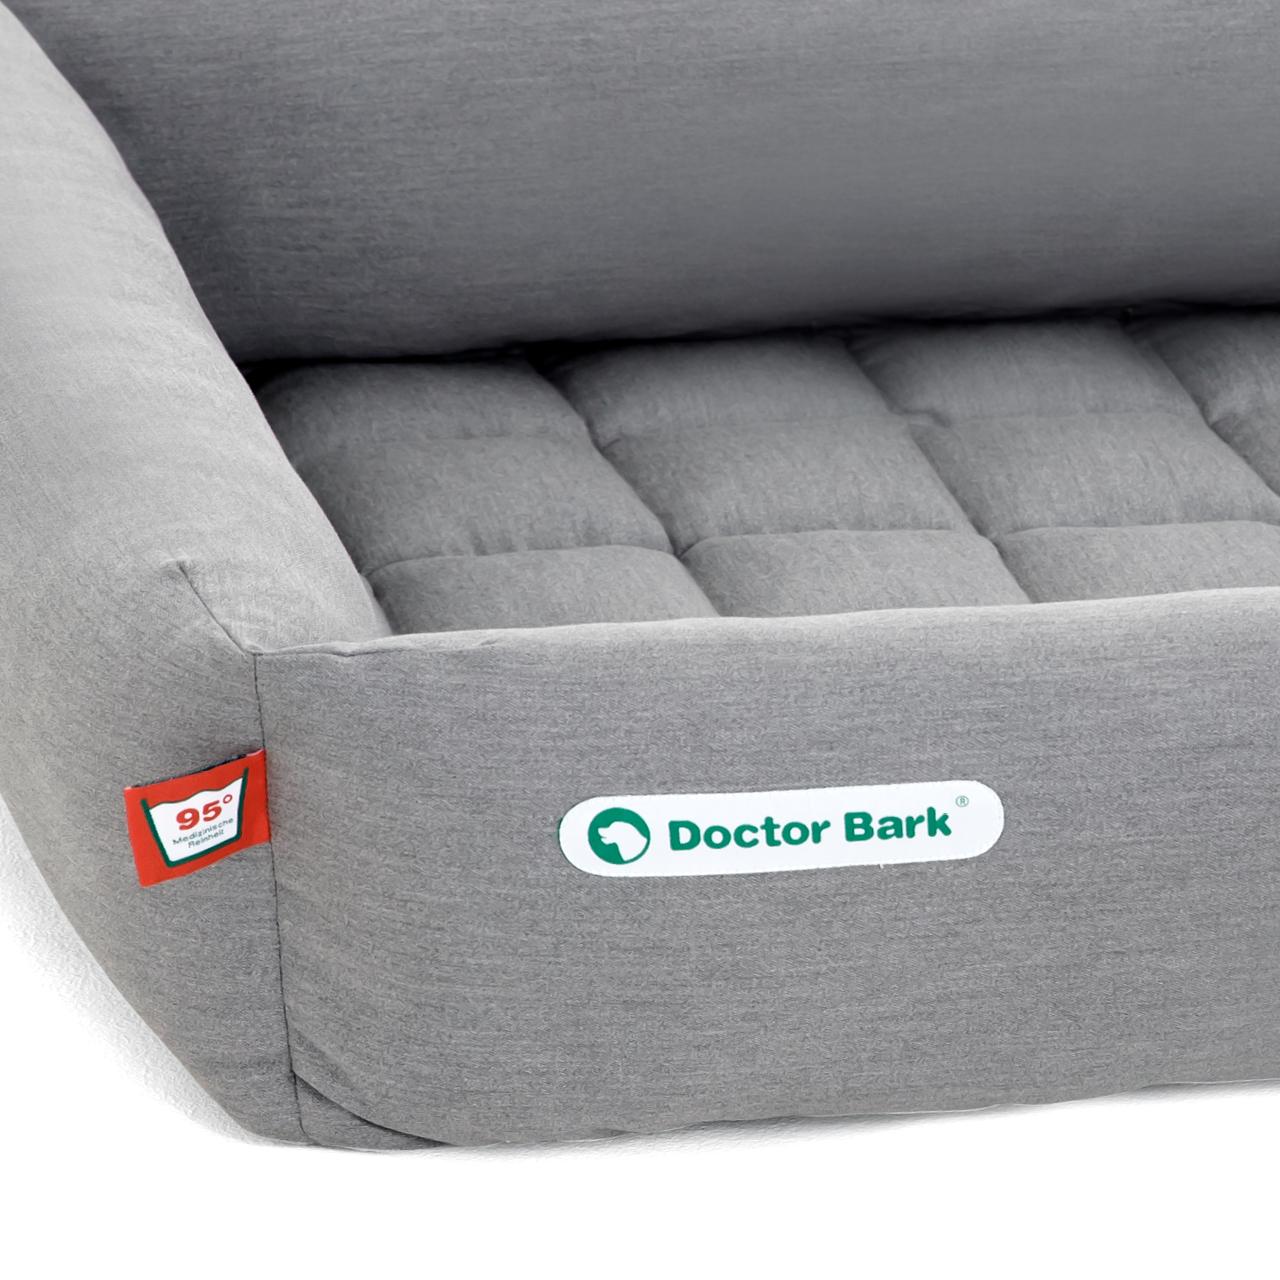 SET Bett + Einlegedecke hellgrau M